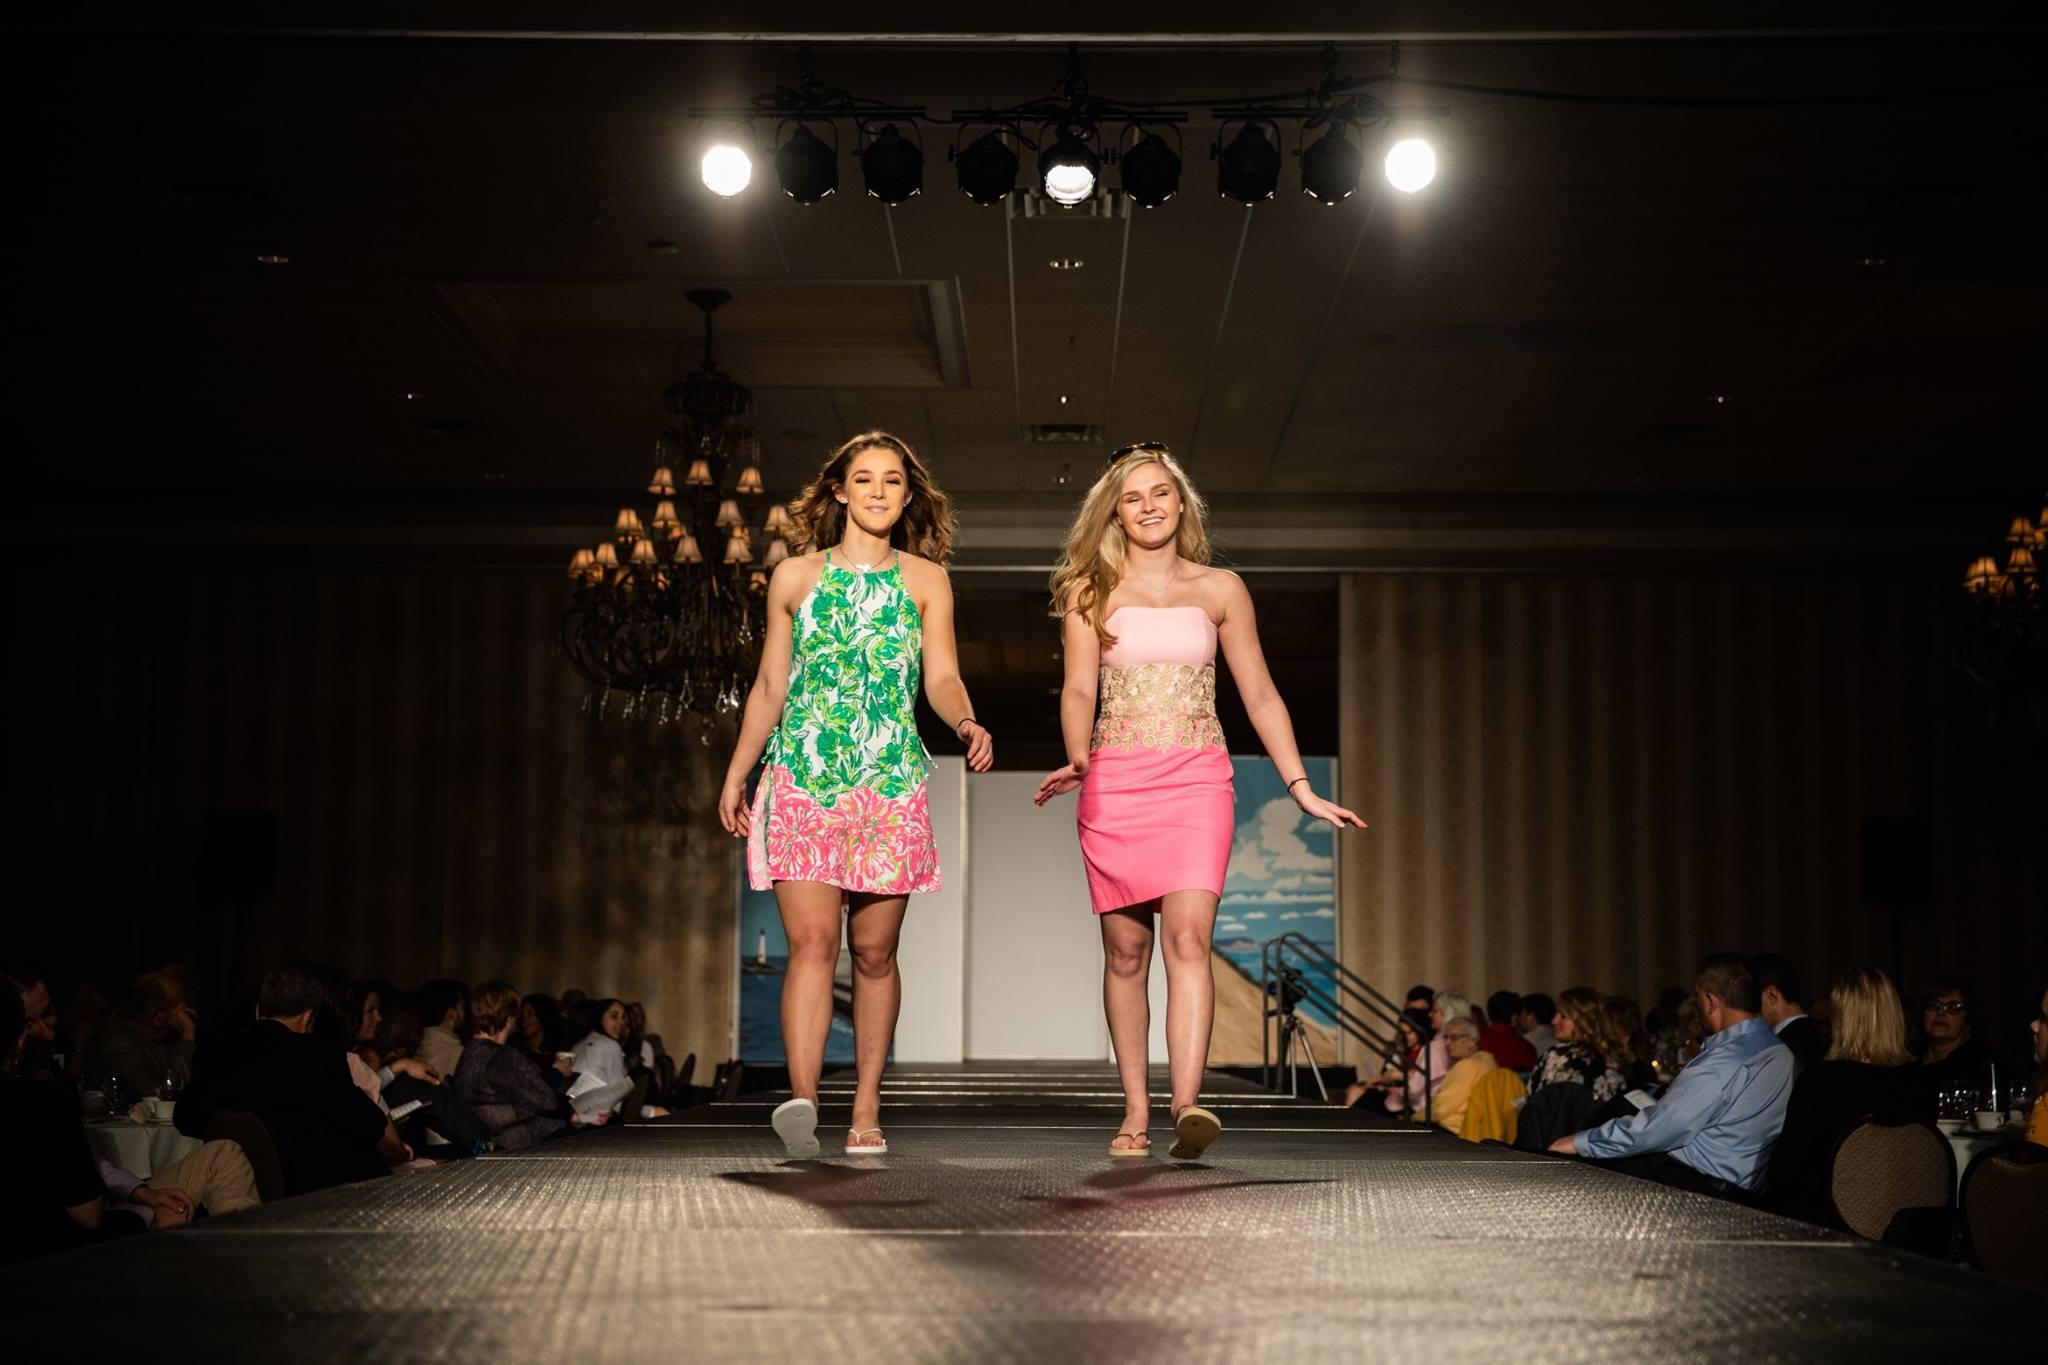 Lutheran_North_High_School_Macomb_Michigan_LHN_Fashion_Show_2019 (19).jpg